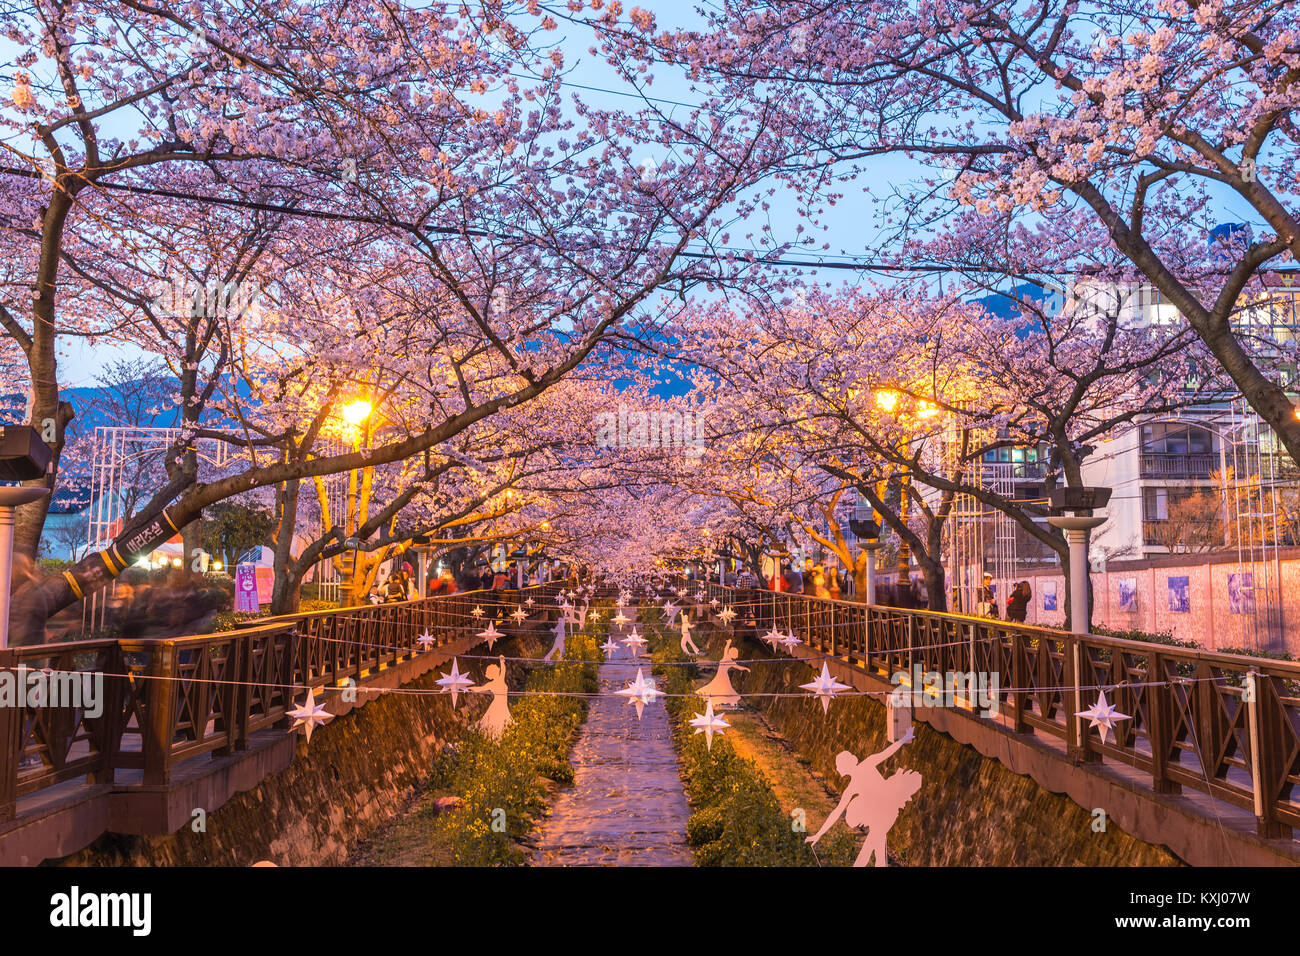 Feder Cherry Blossom Festival in der Yeojwacheon Stream bei Nacht, Jinhae, Südkorea Stockbild